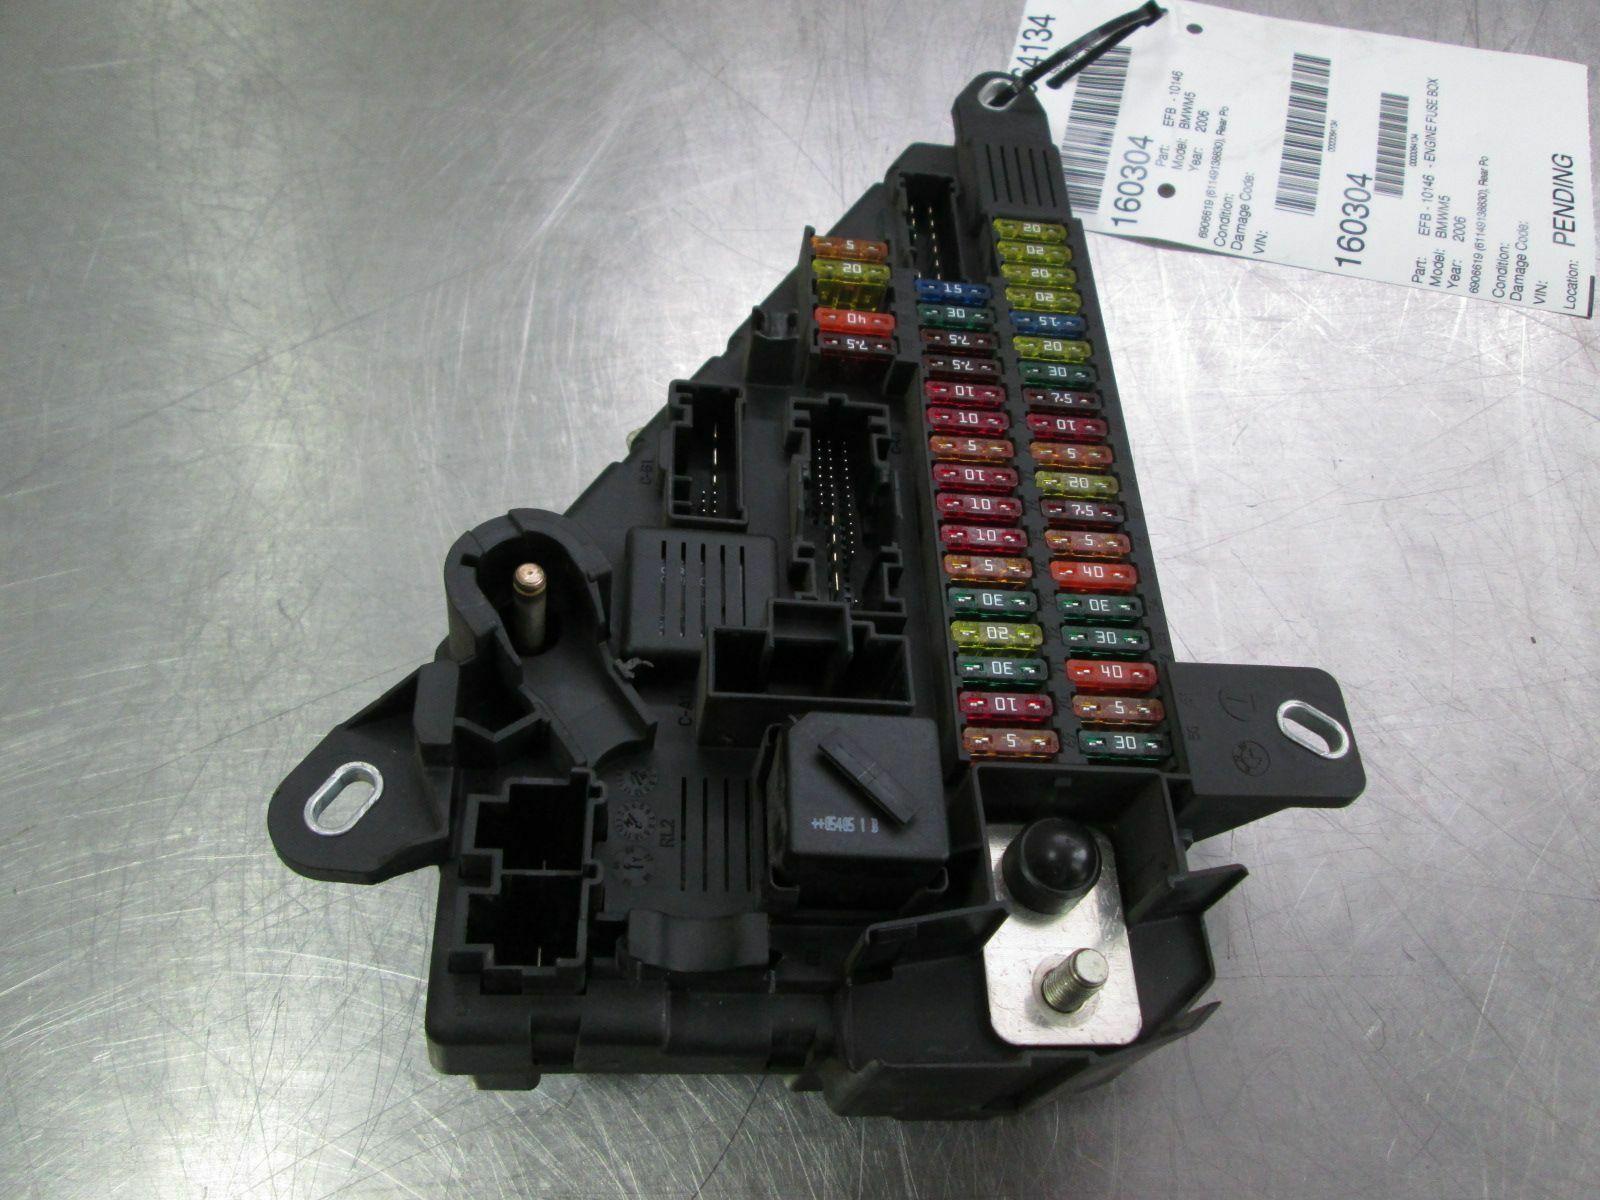 e39 m5 fuse diagram touch wiring diagrams e39 relay diagram m5 fuse box wiring diagram online e46 330ci fuse diagram e39 m5 fuse diagram